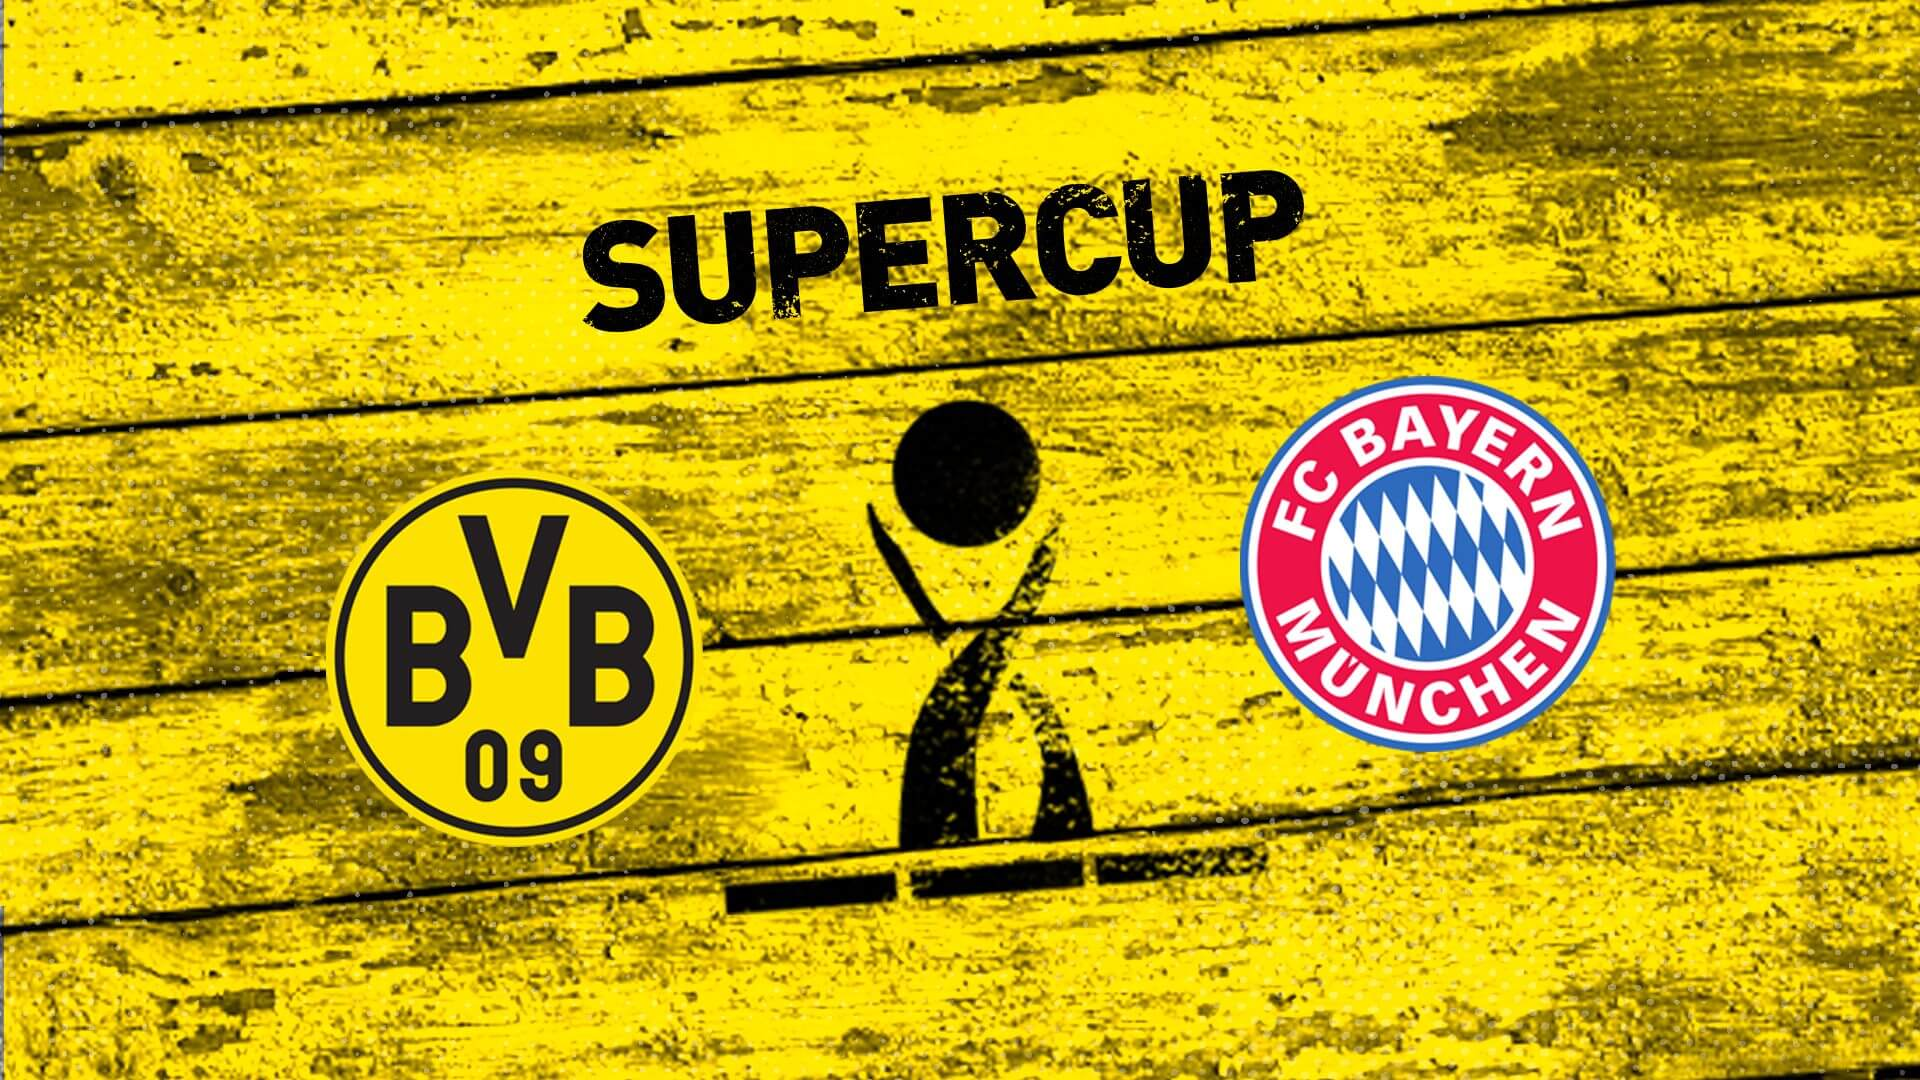 Super Cup BVB Bayern